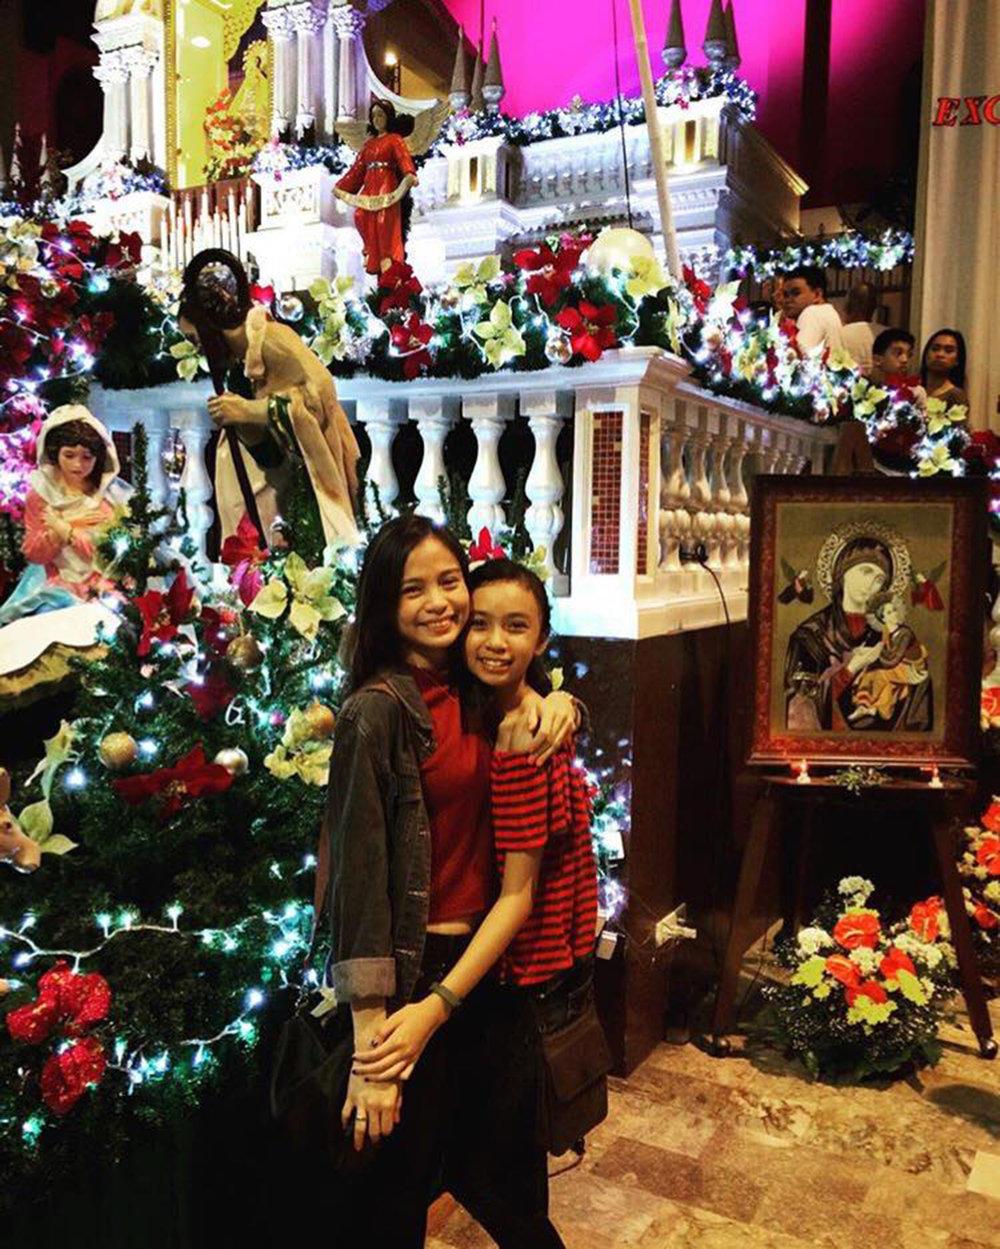 Leanna Villanueva looks forward to the charm of a provincial celebration.